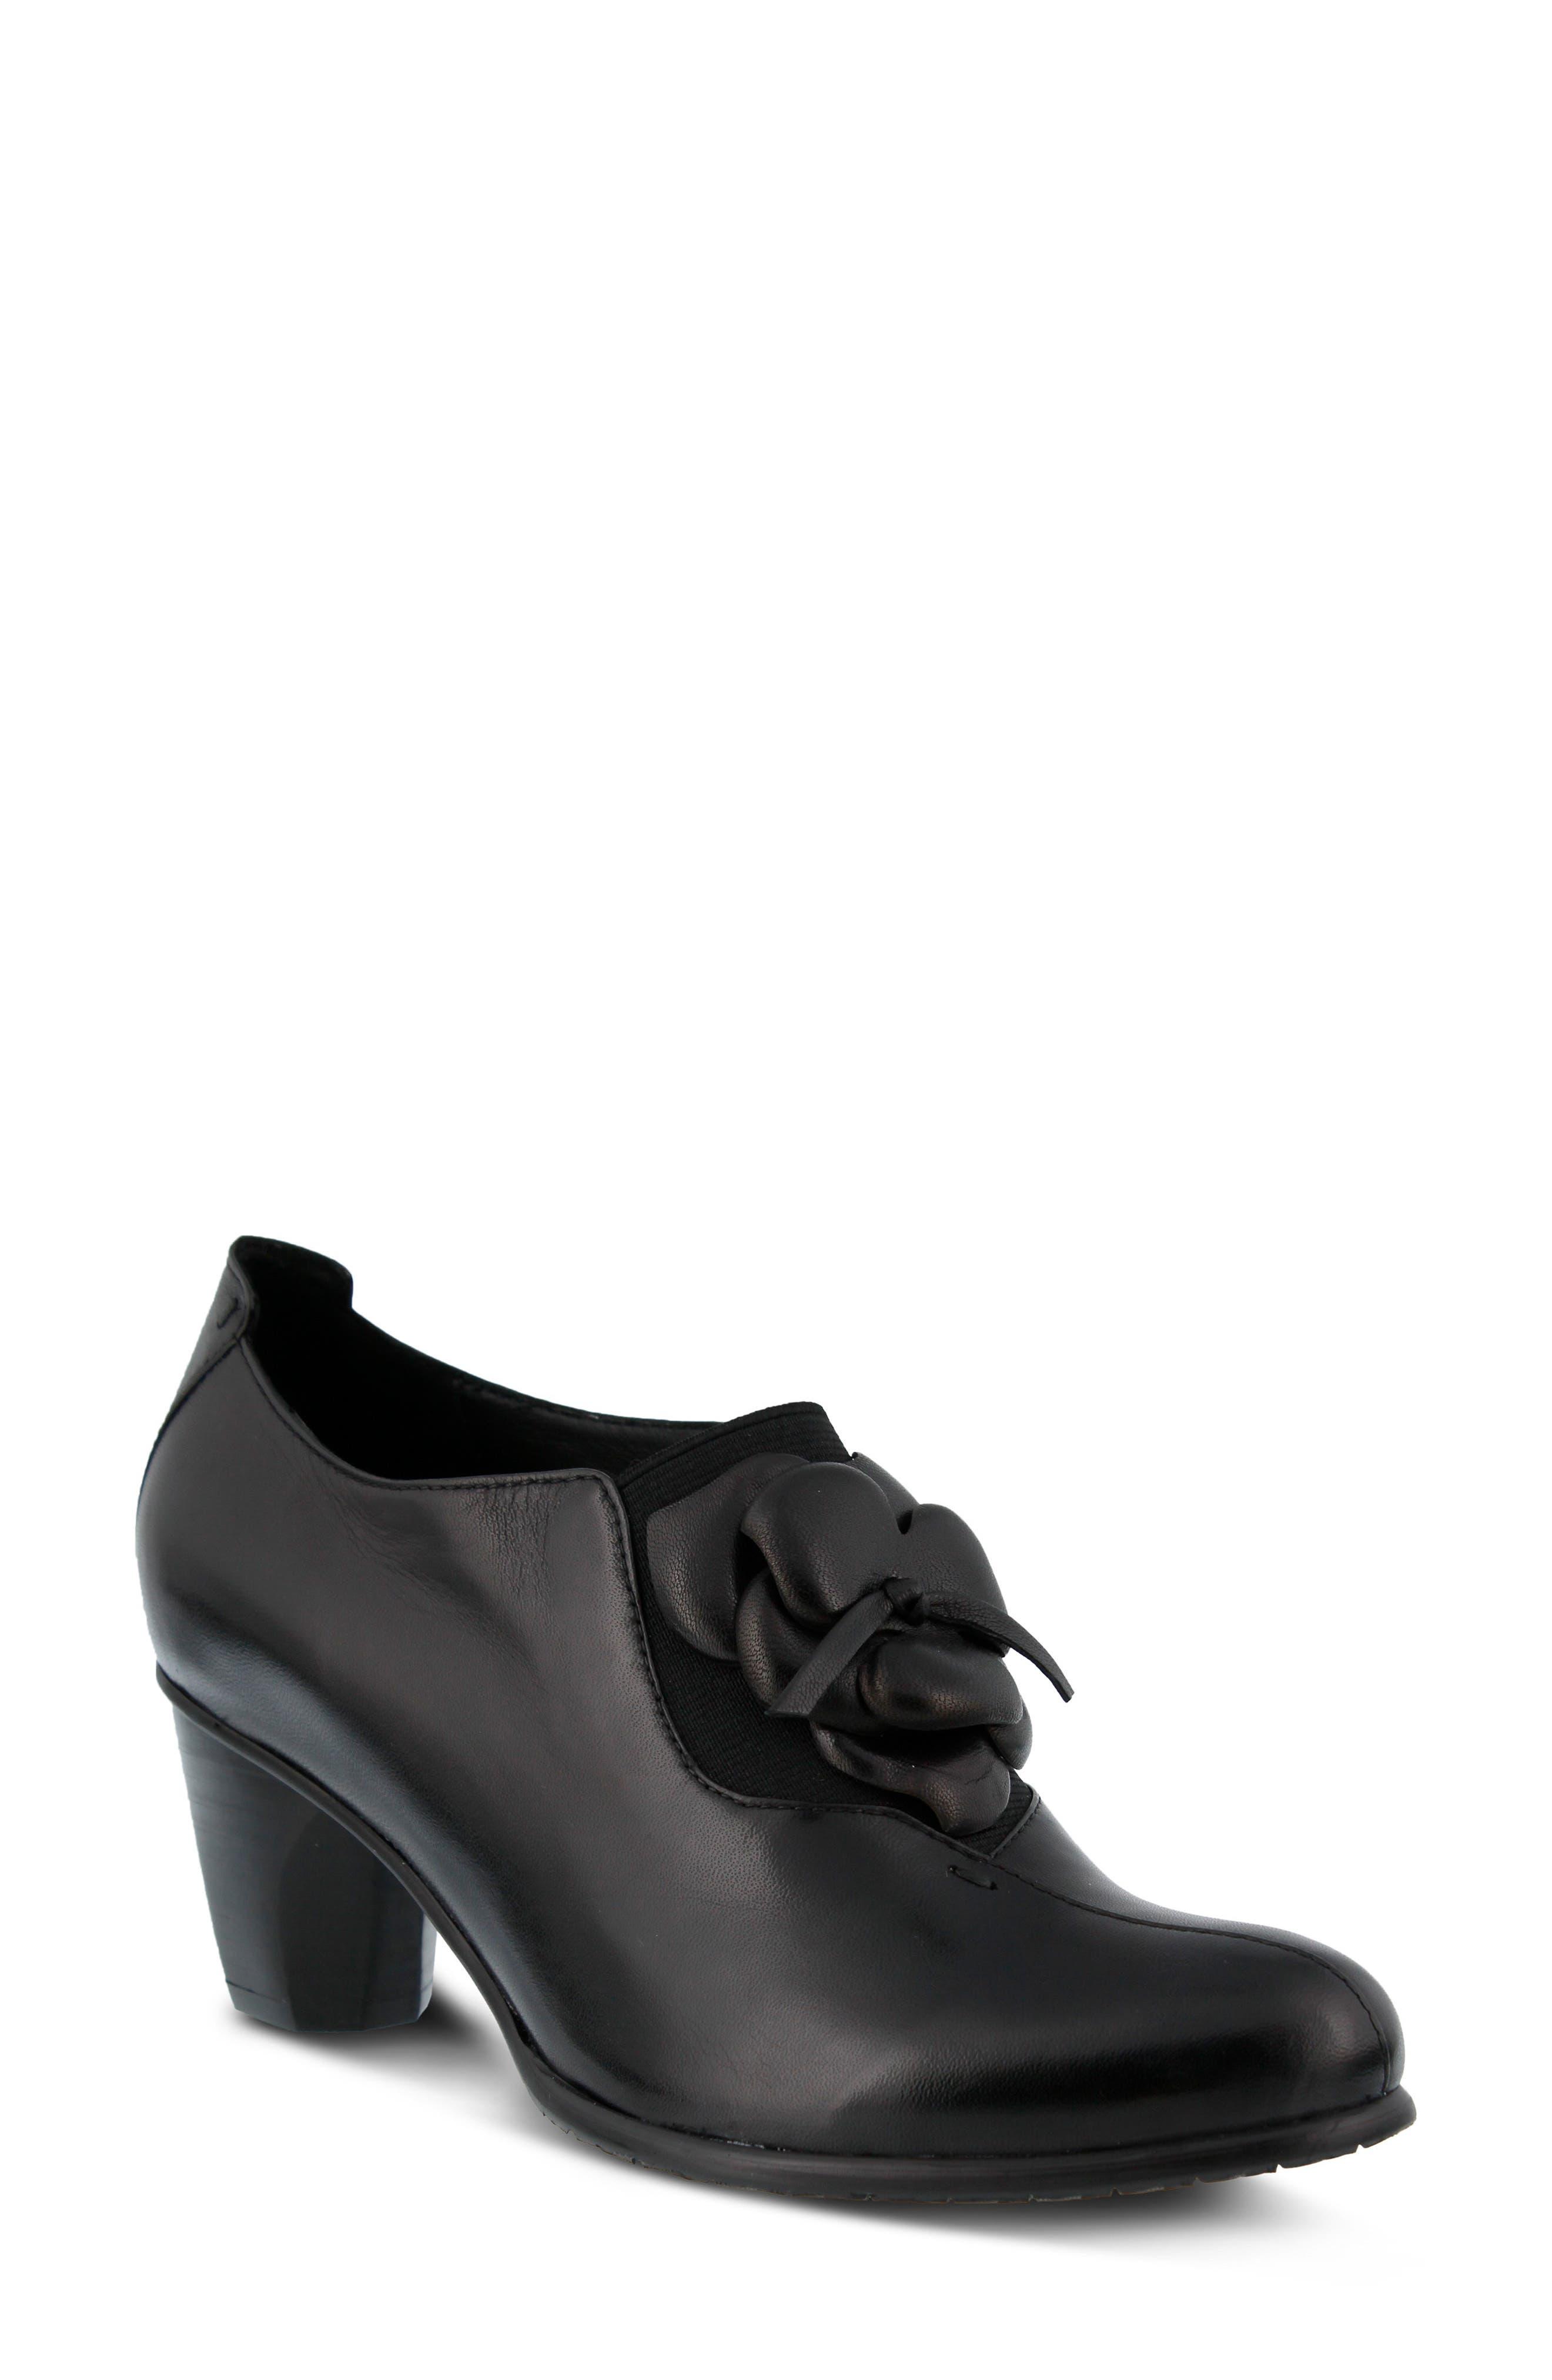 Evelina Pump,                         Main,                         color, Black Leather